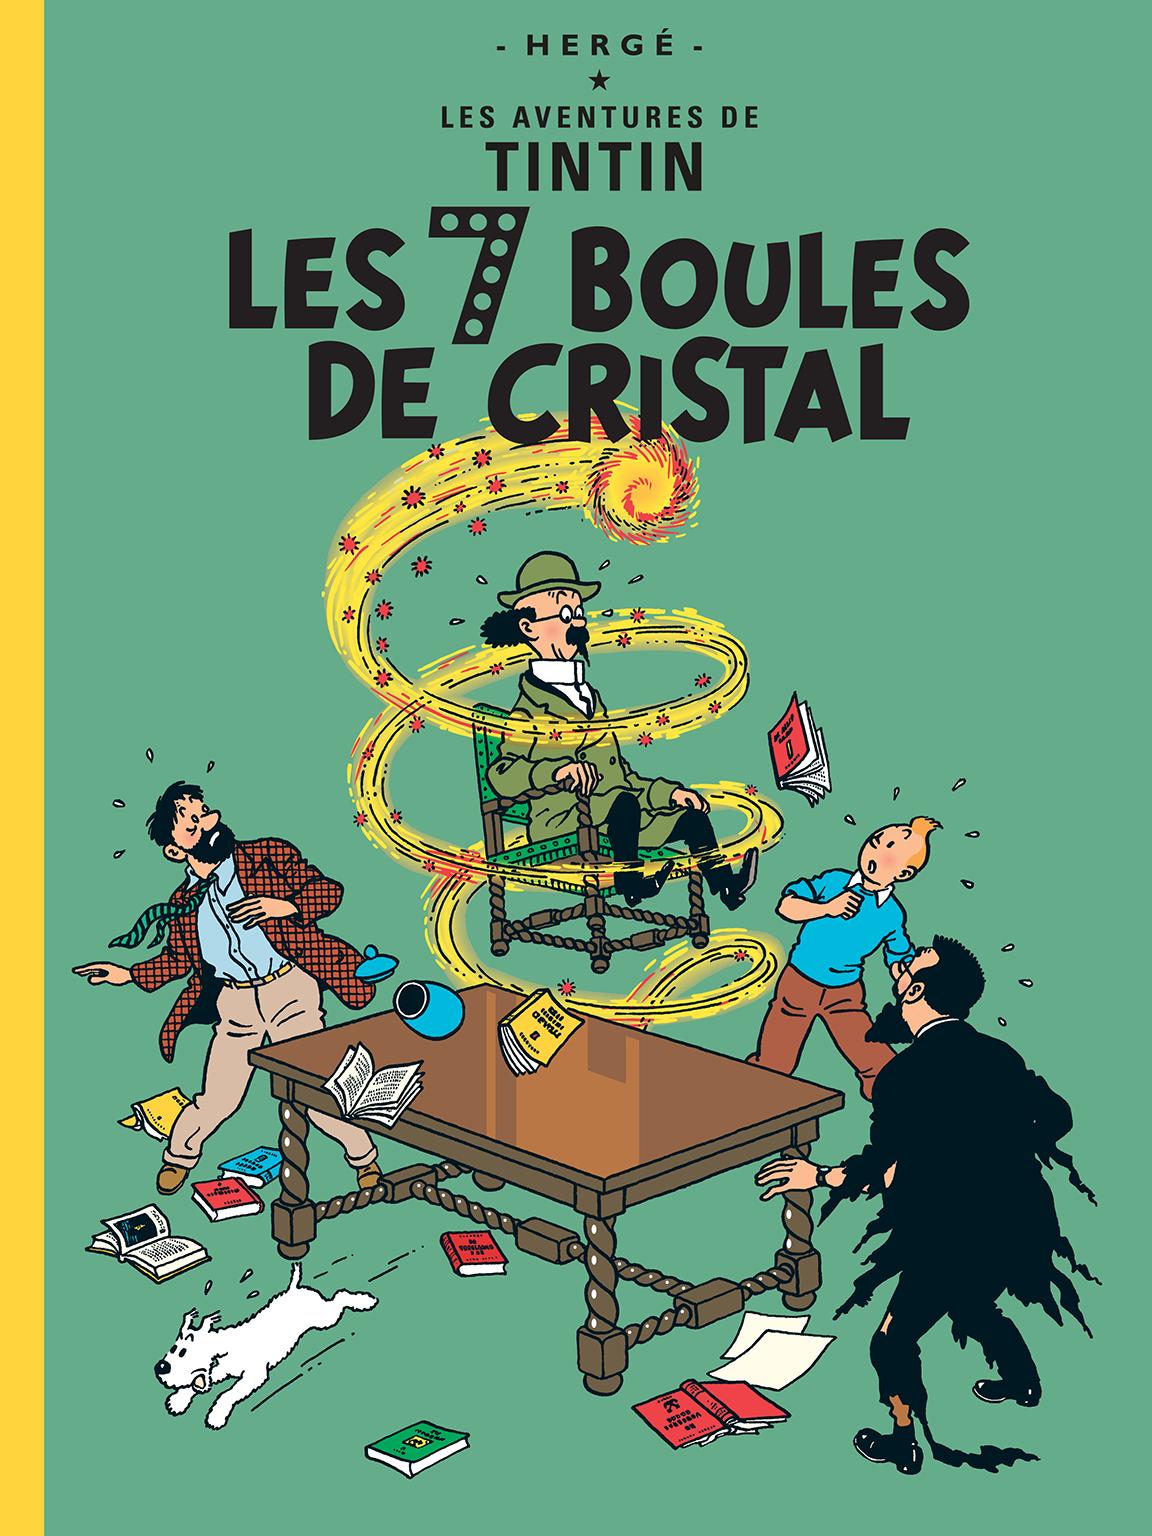 TINTIN The Seven Crystal Balls Hergé RG tintin.com